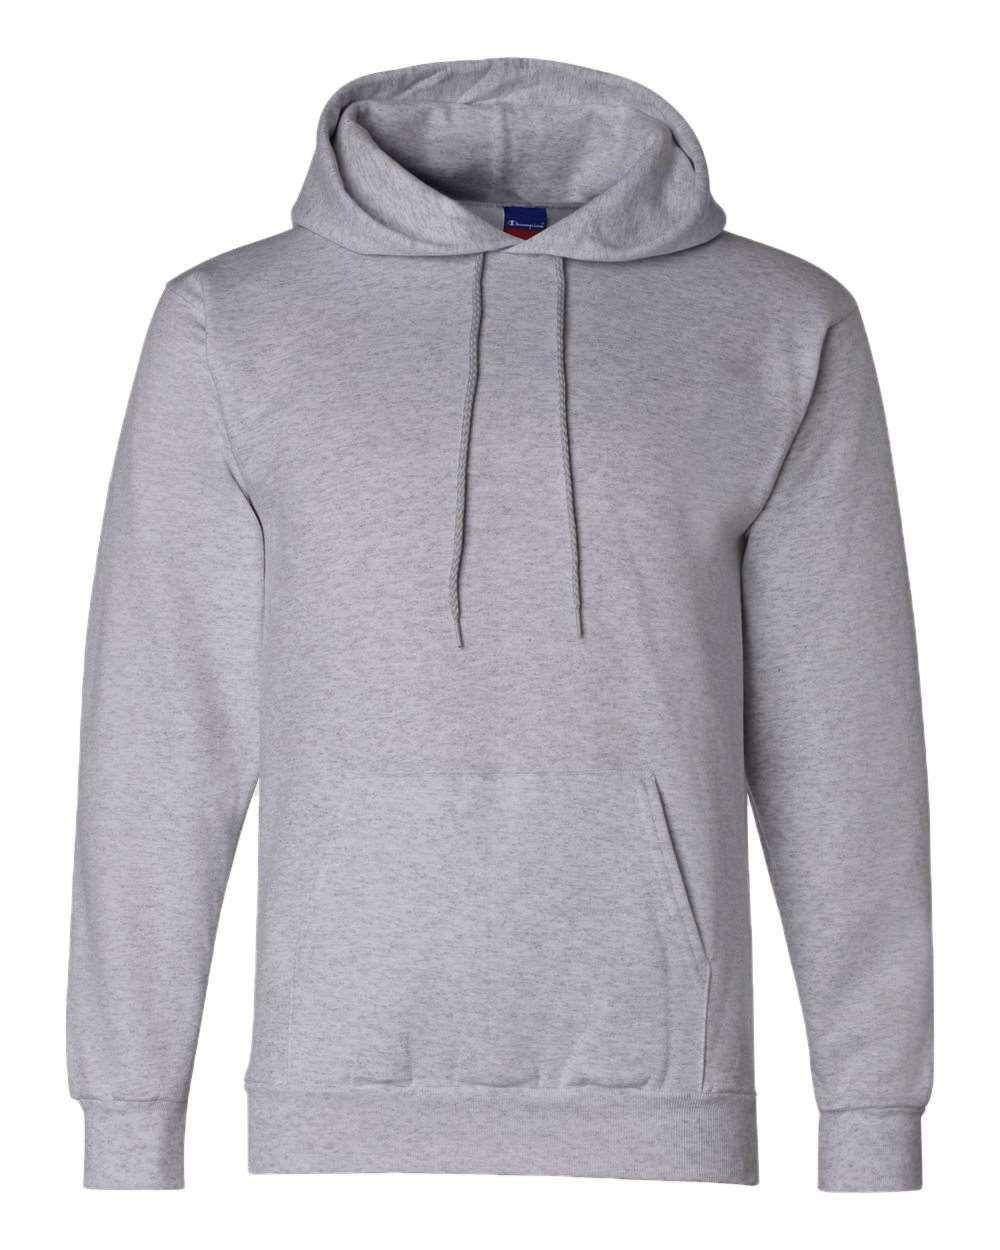 Champion Double Dry Eco Hooded Sweatshirt S700 Hooded Sweatshirts Hooded Pullover Sweatshirts Hoodie [ 1250 x 1000 Pixel ]